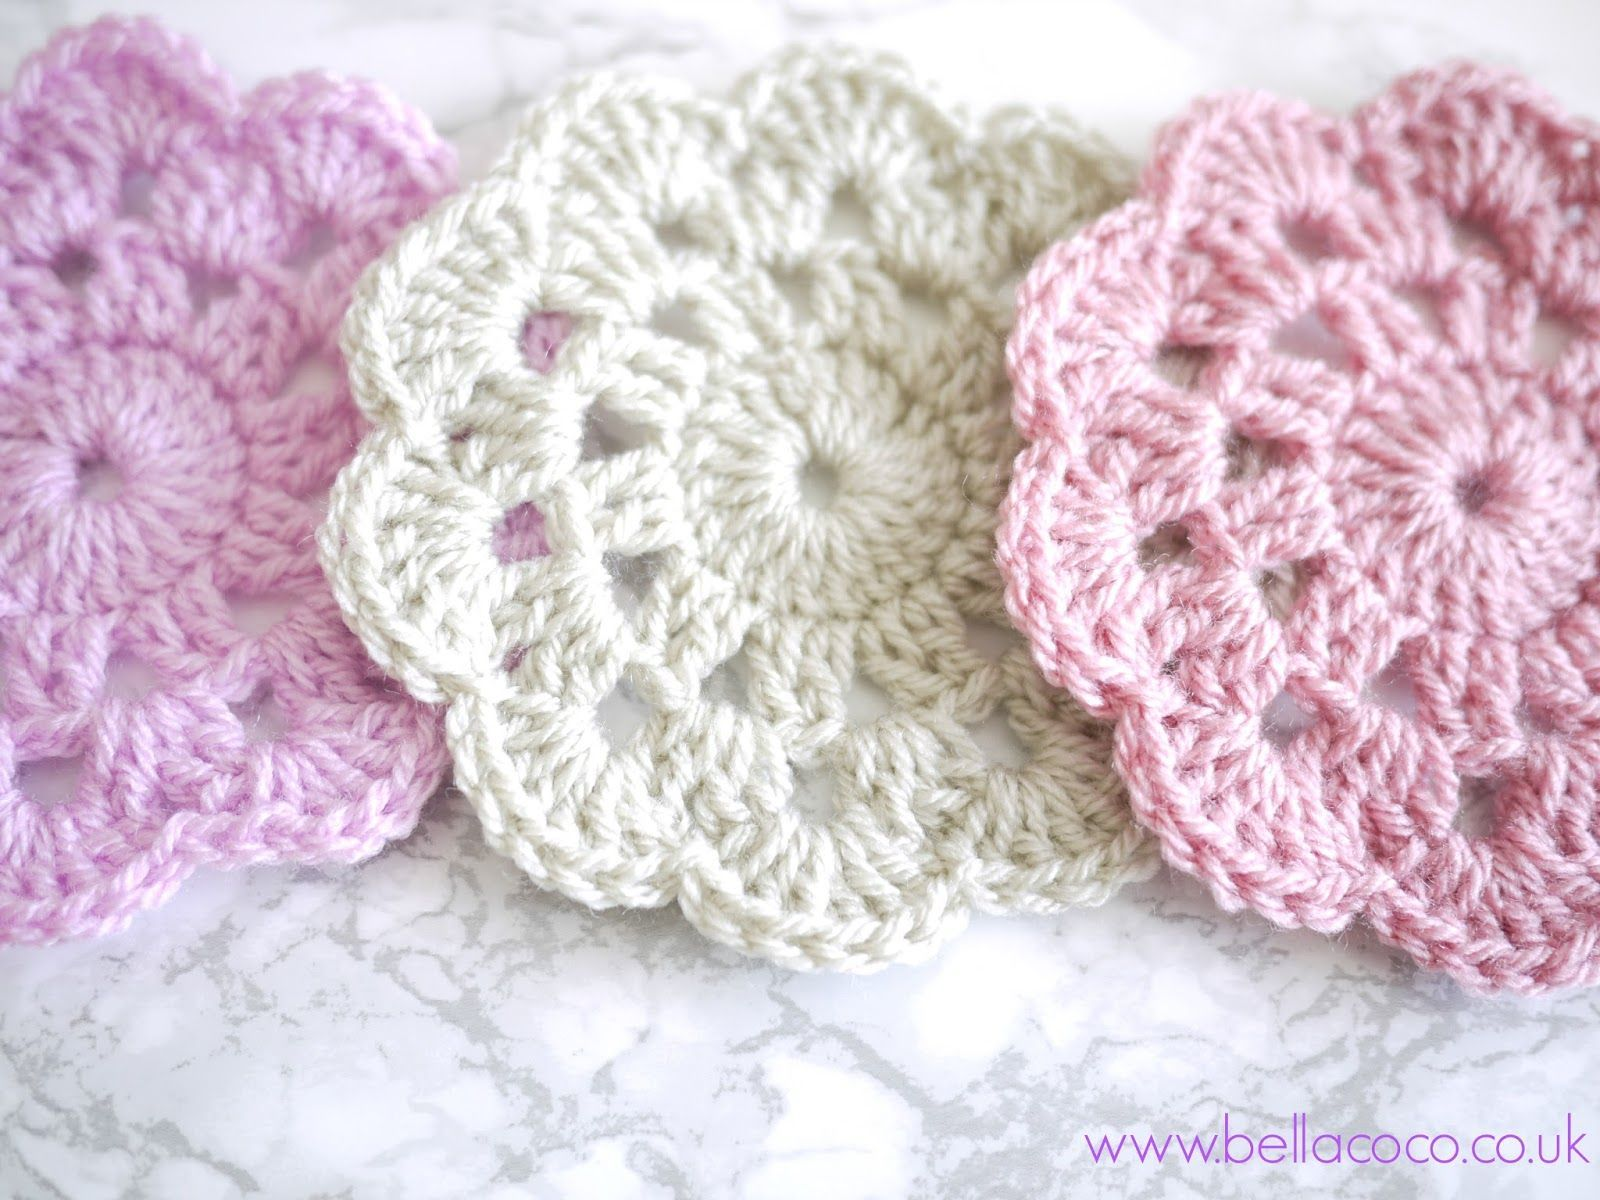 Crochet coasters free pattern | Bella Coco | tığ işi | Pinterest